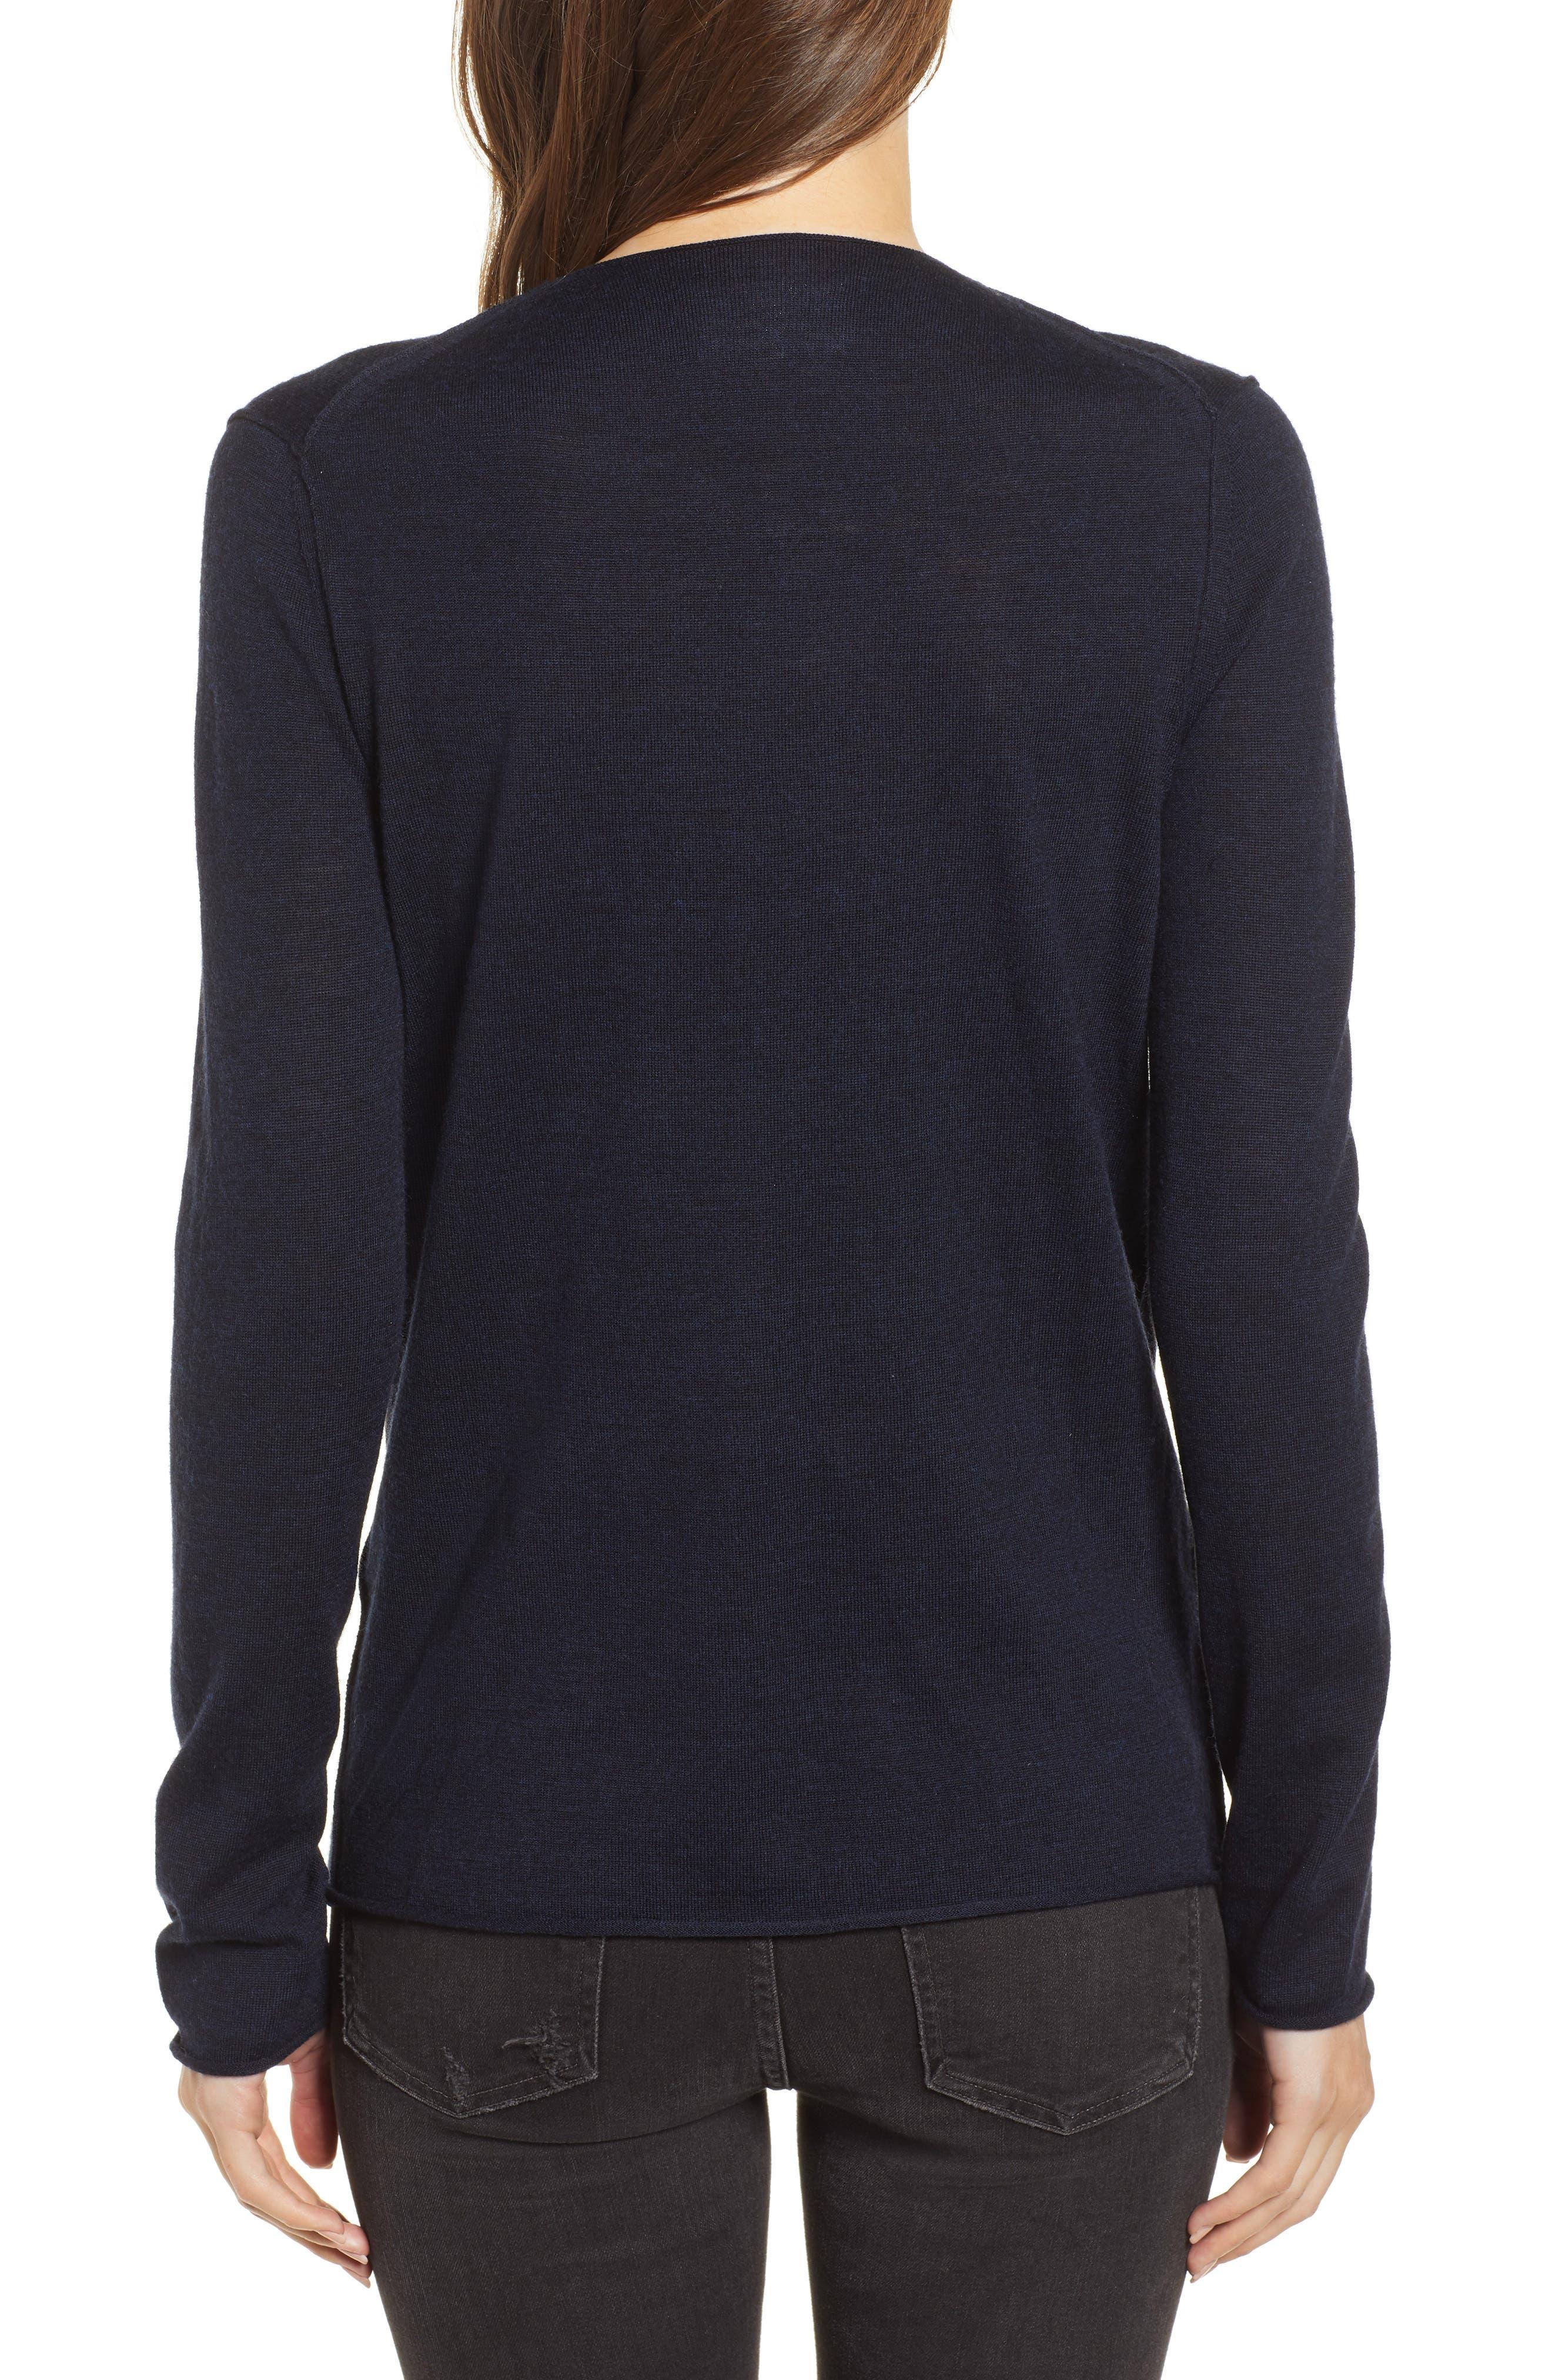 Gwendal Bis Wool Sweater,                             Alternate thumbnail 2, color,                             008